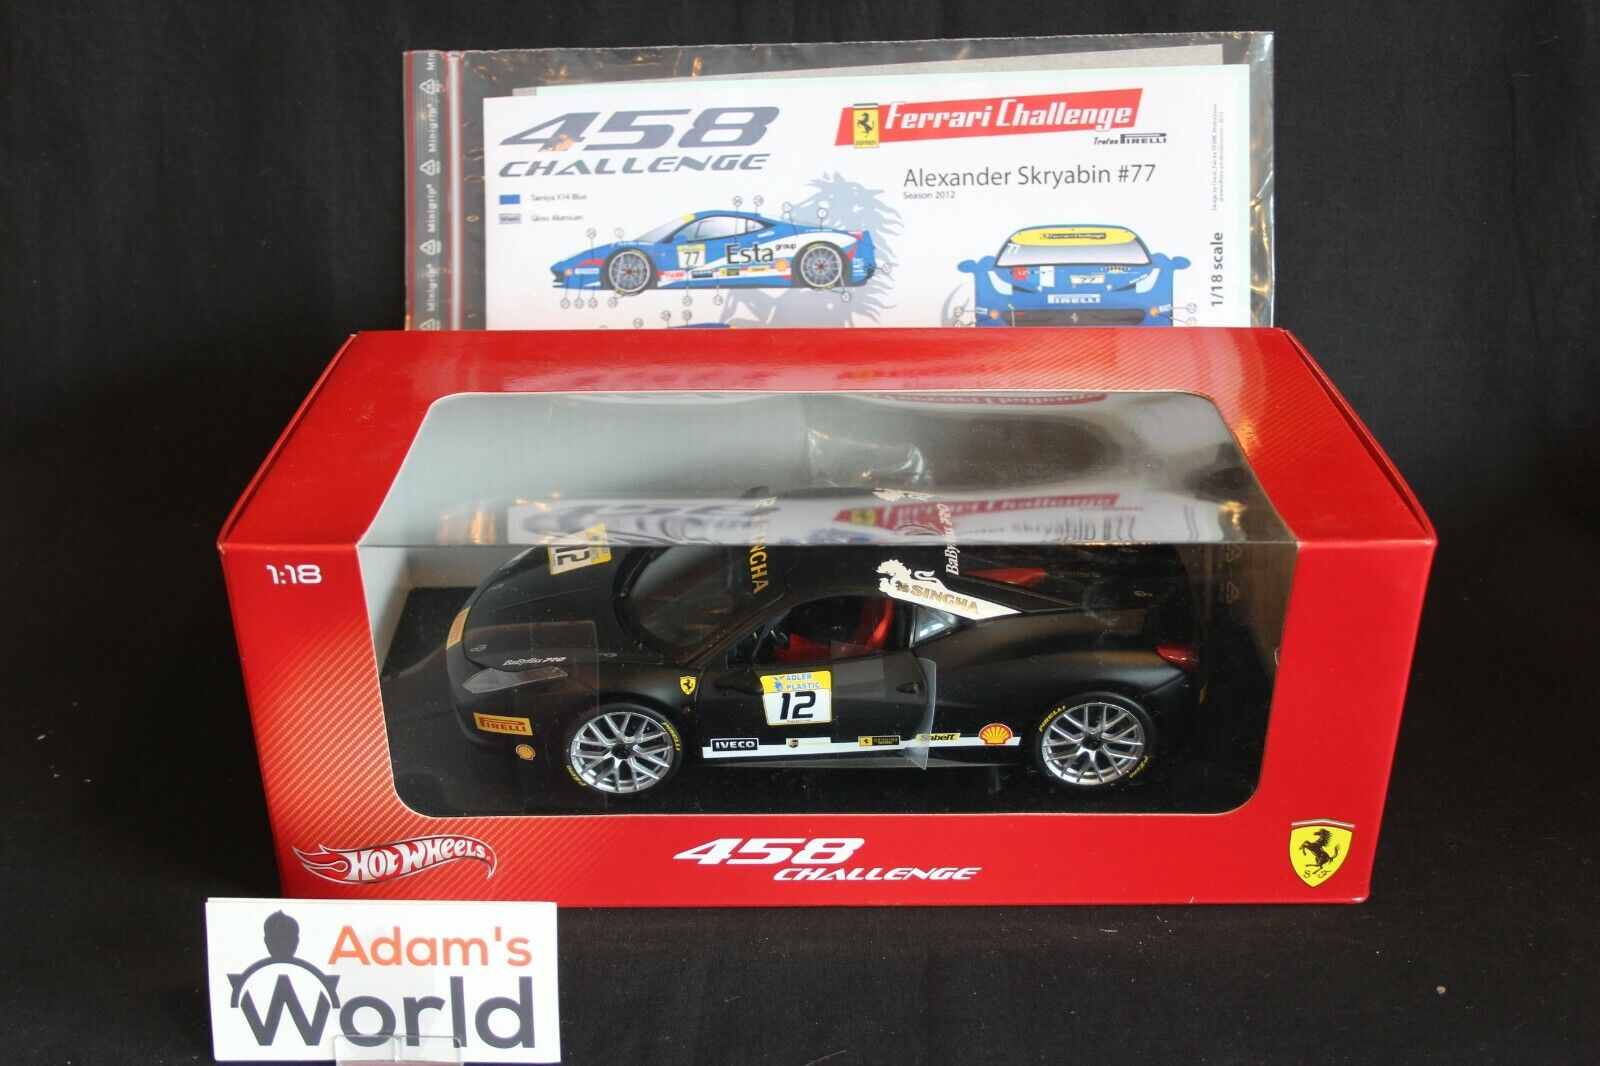 Hot Wheels Ferrari Ferrari 458 Challenge 2012 1 18 + decal set (PJBB)